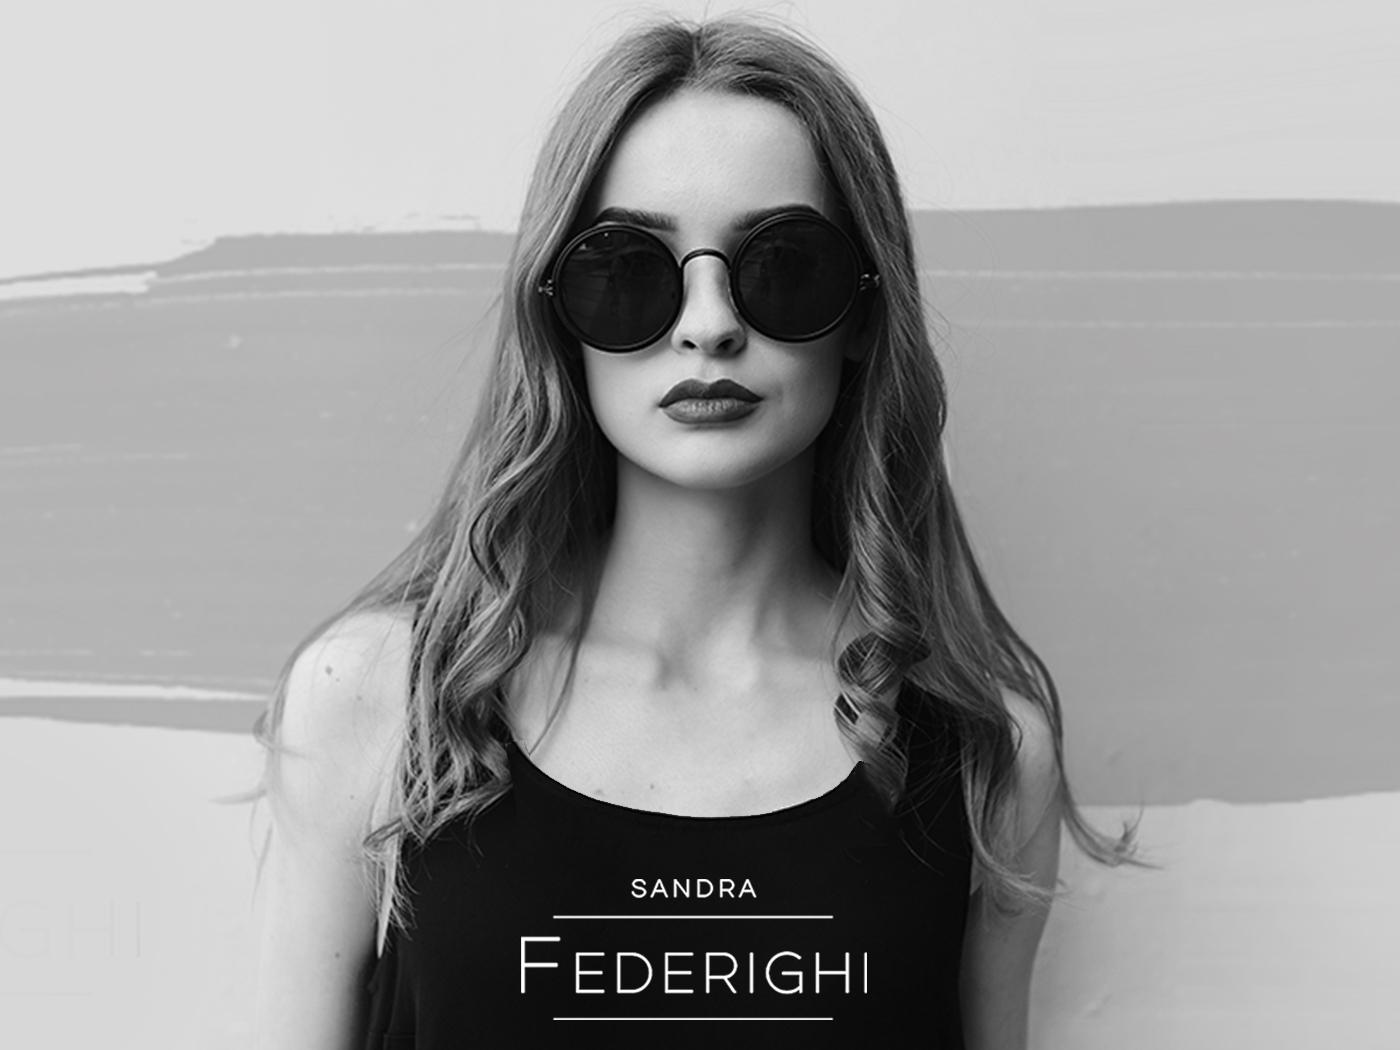 Brand Identity work for Sandra Federighi